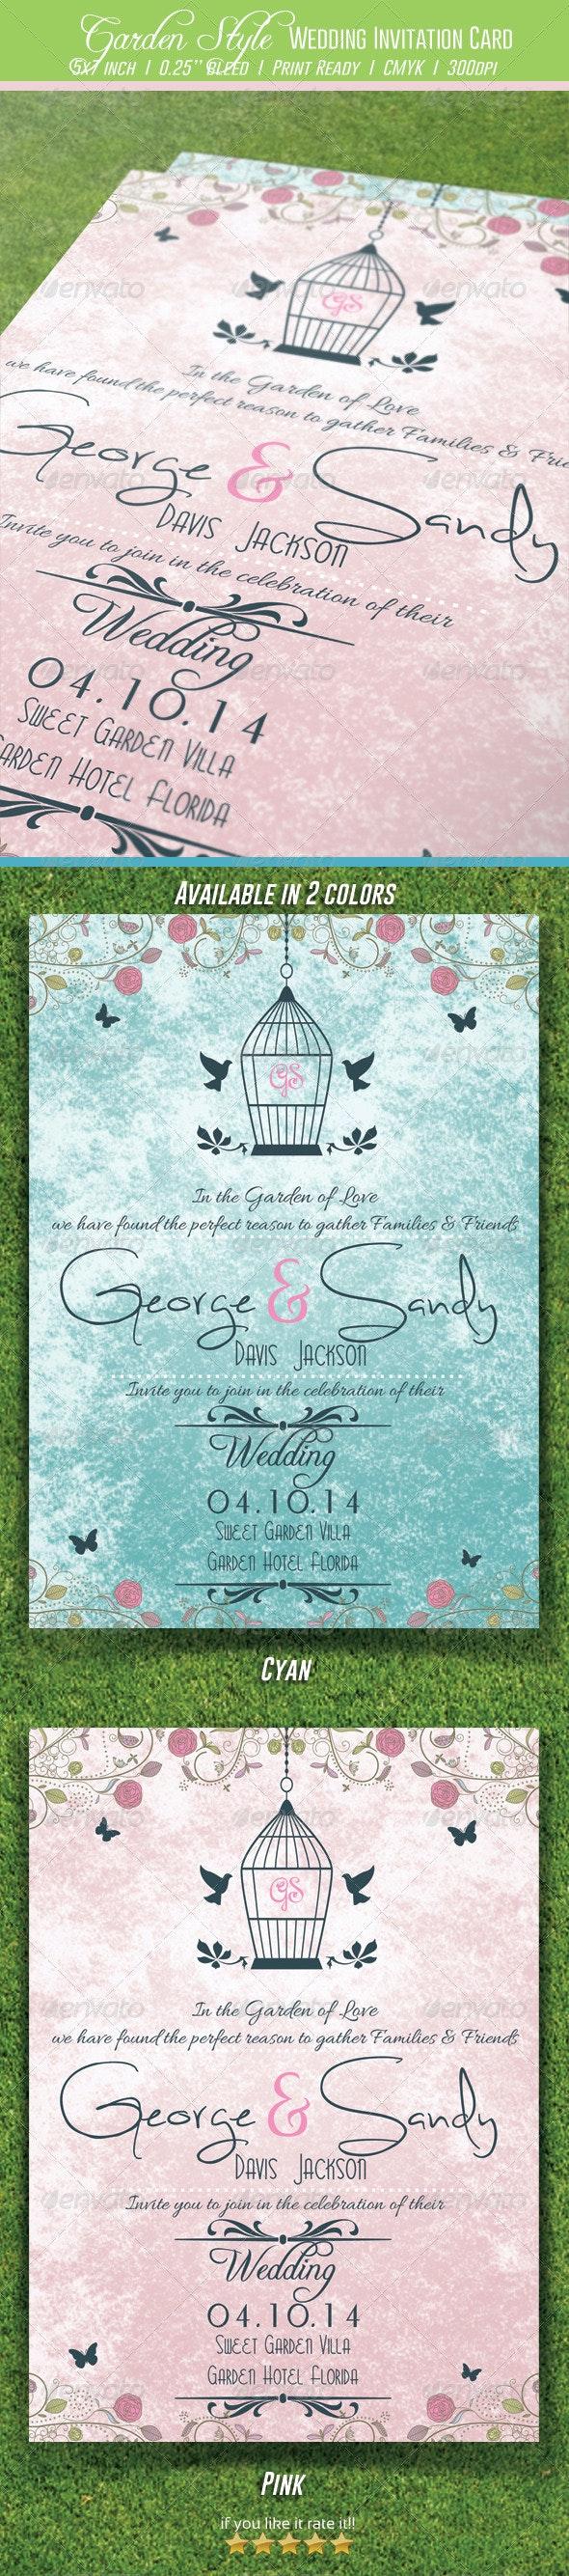 Garden Style Wedding Invitation Card - Weddings Cards & Invites